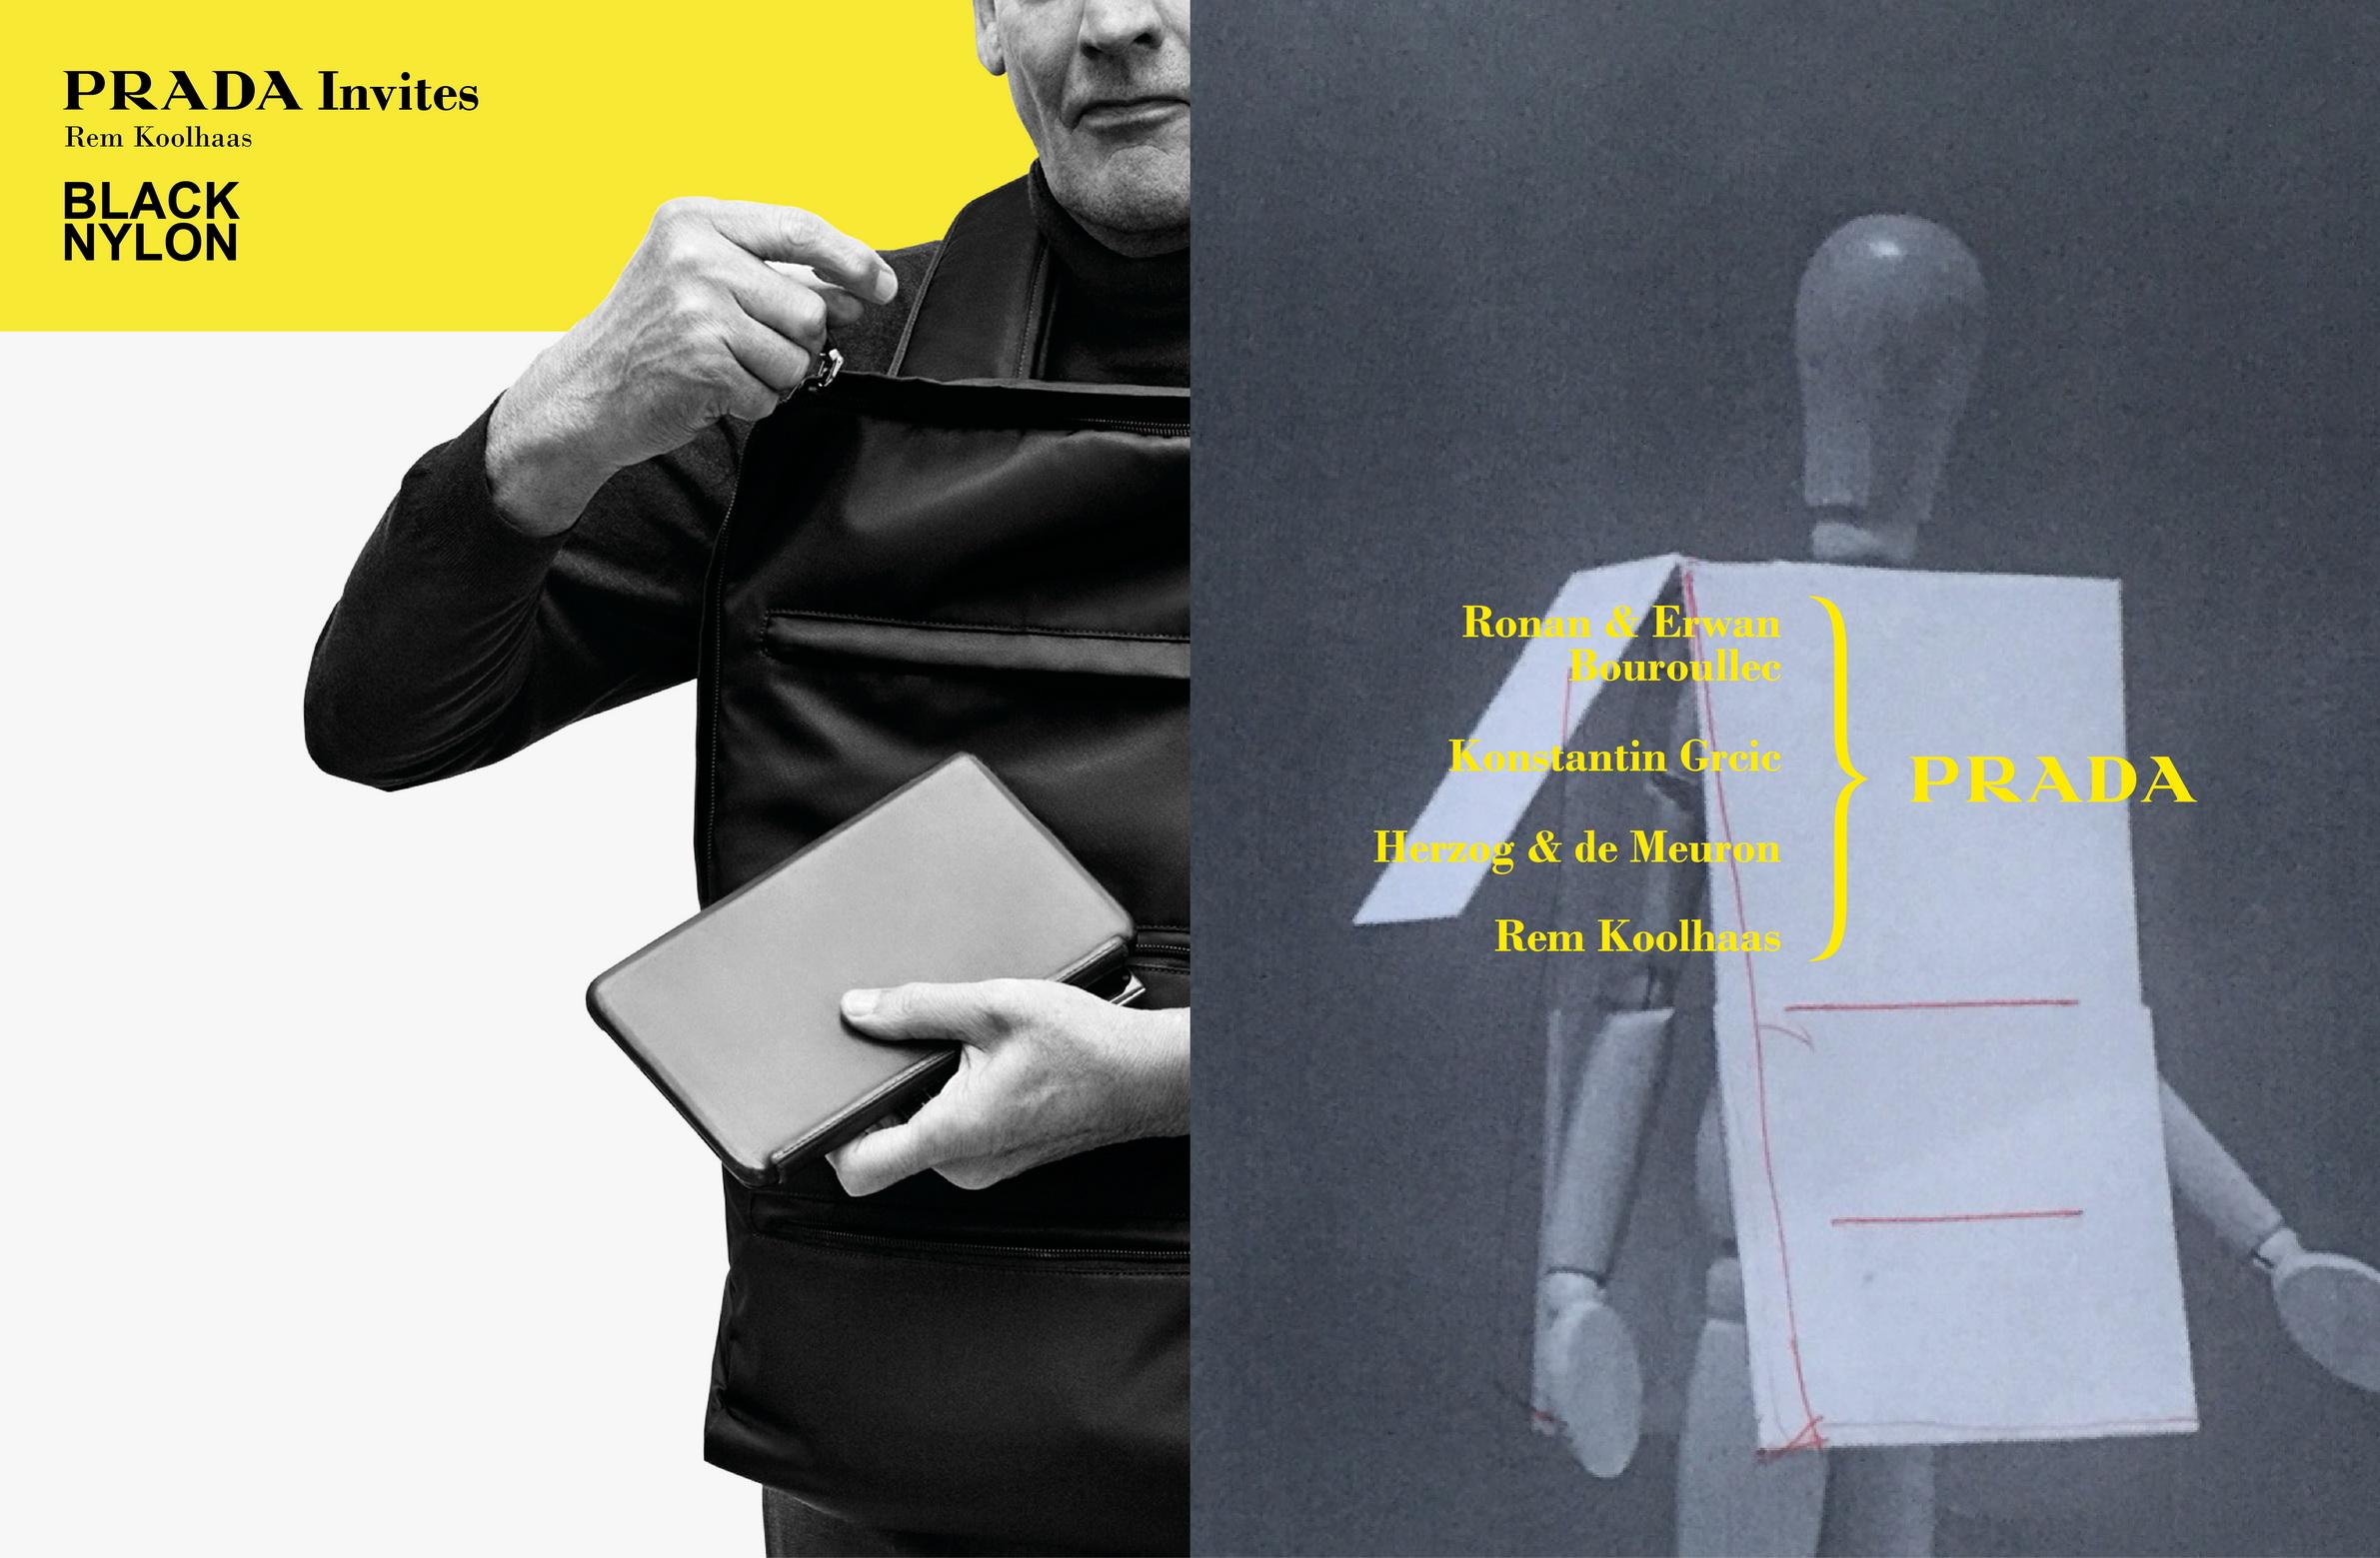 Prada Invites Advertising Campaign_Rem Koolhaas